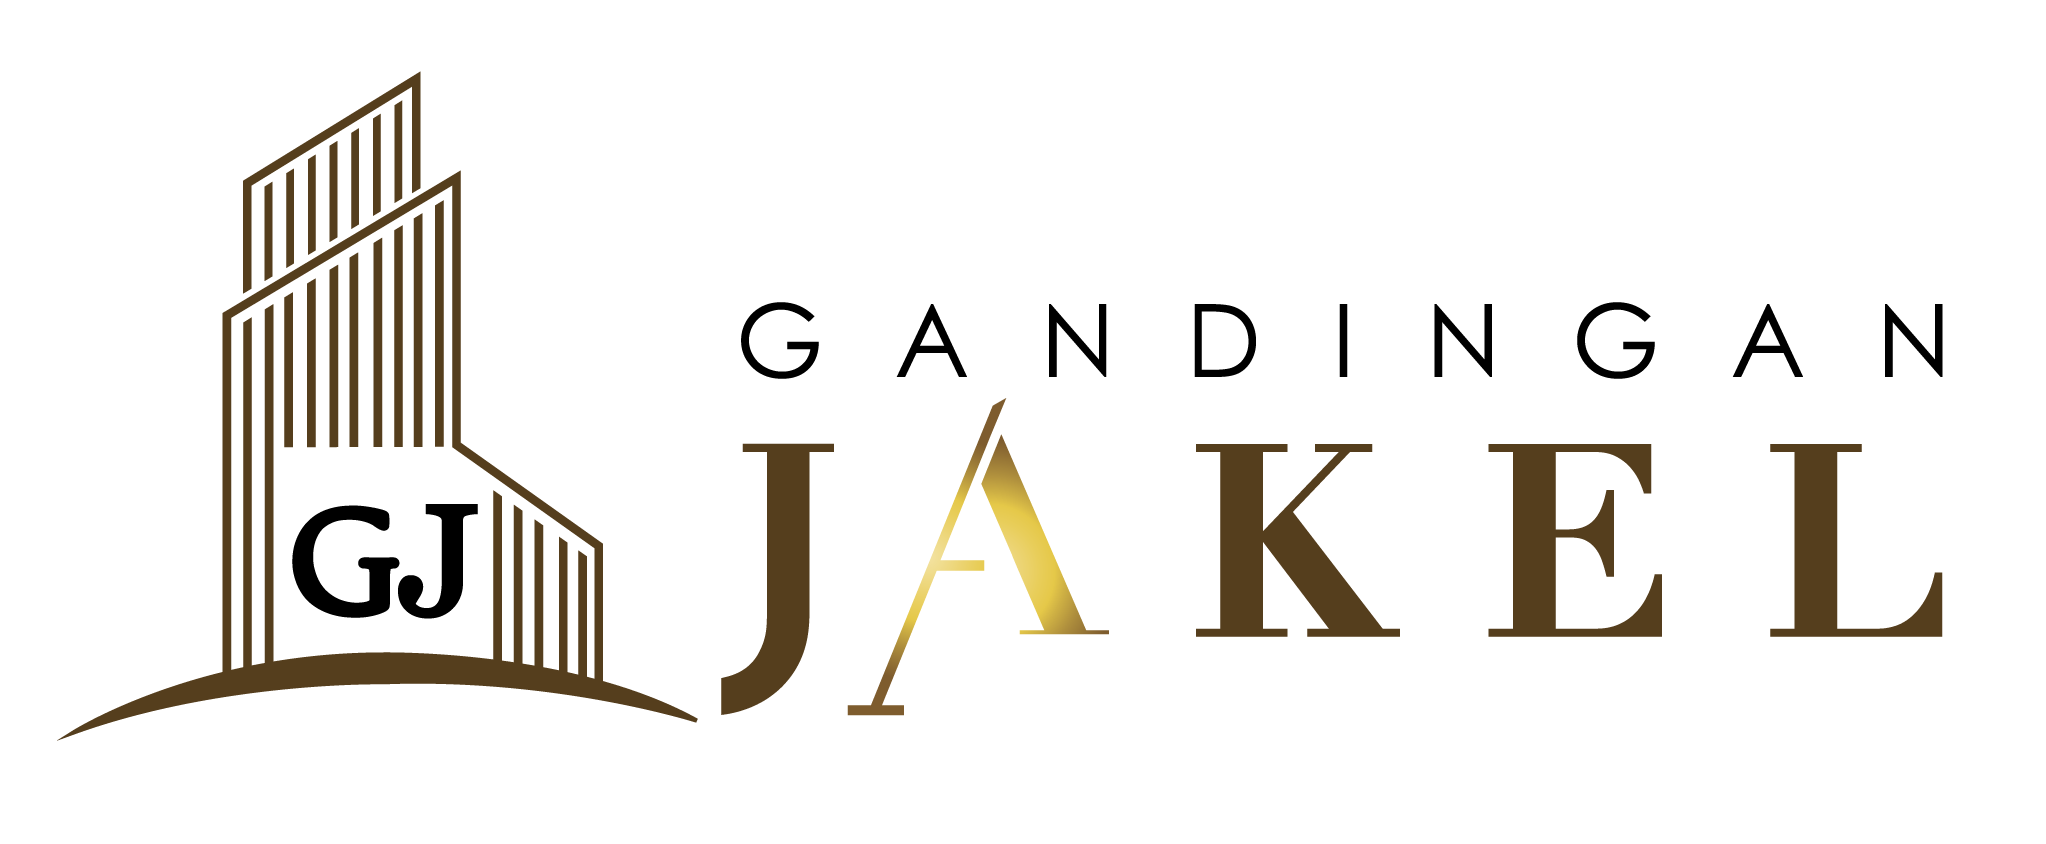 Gandingan jakel logo 01